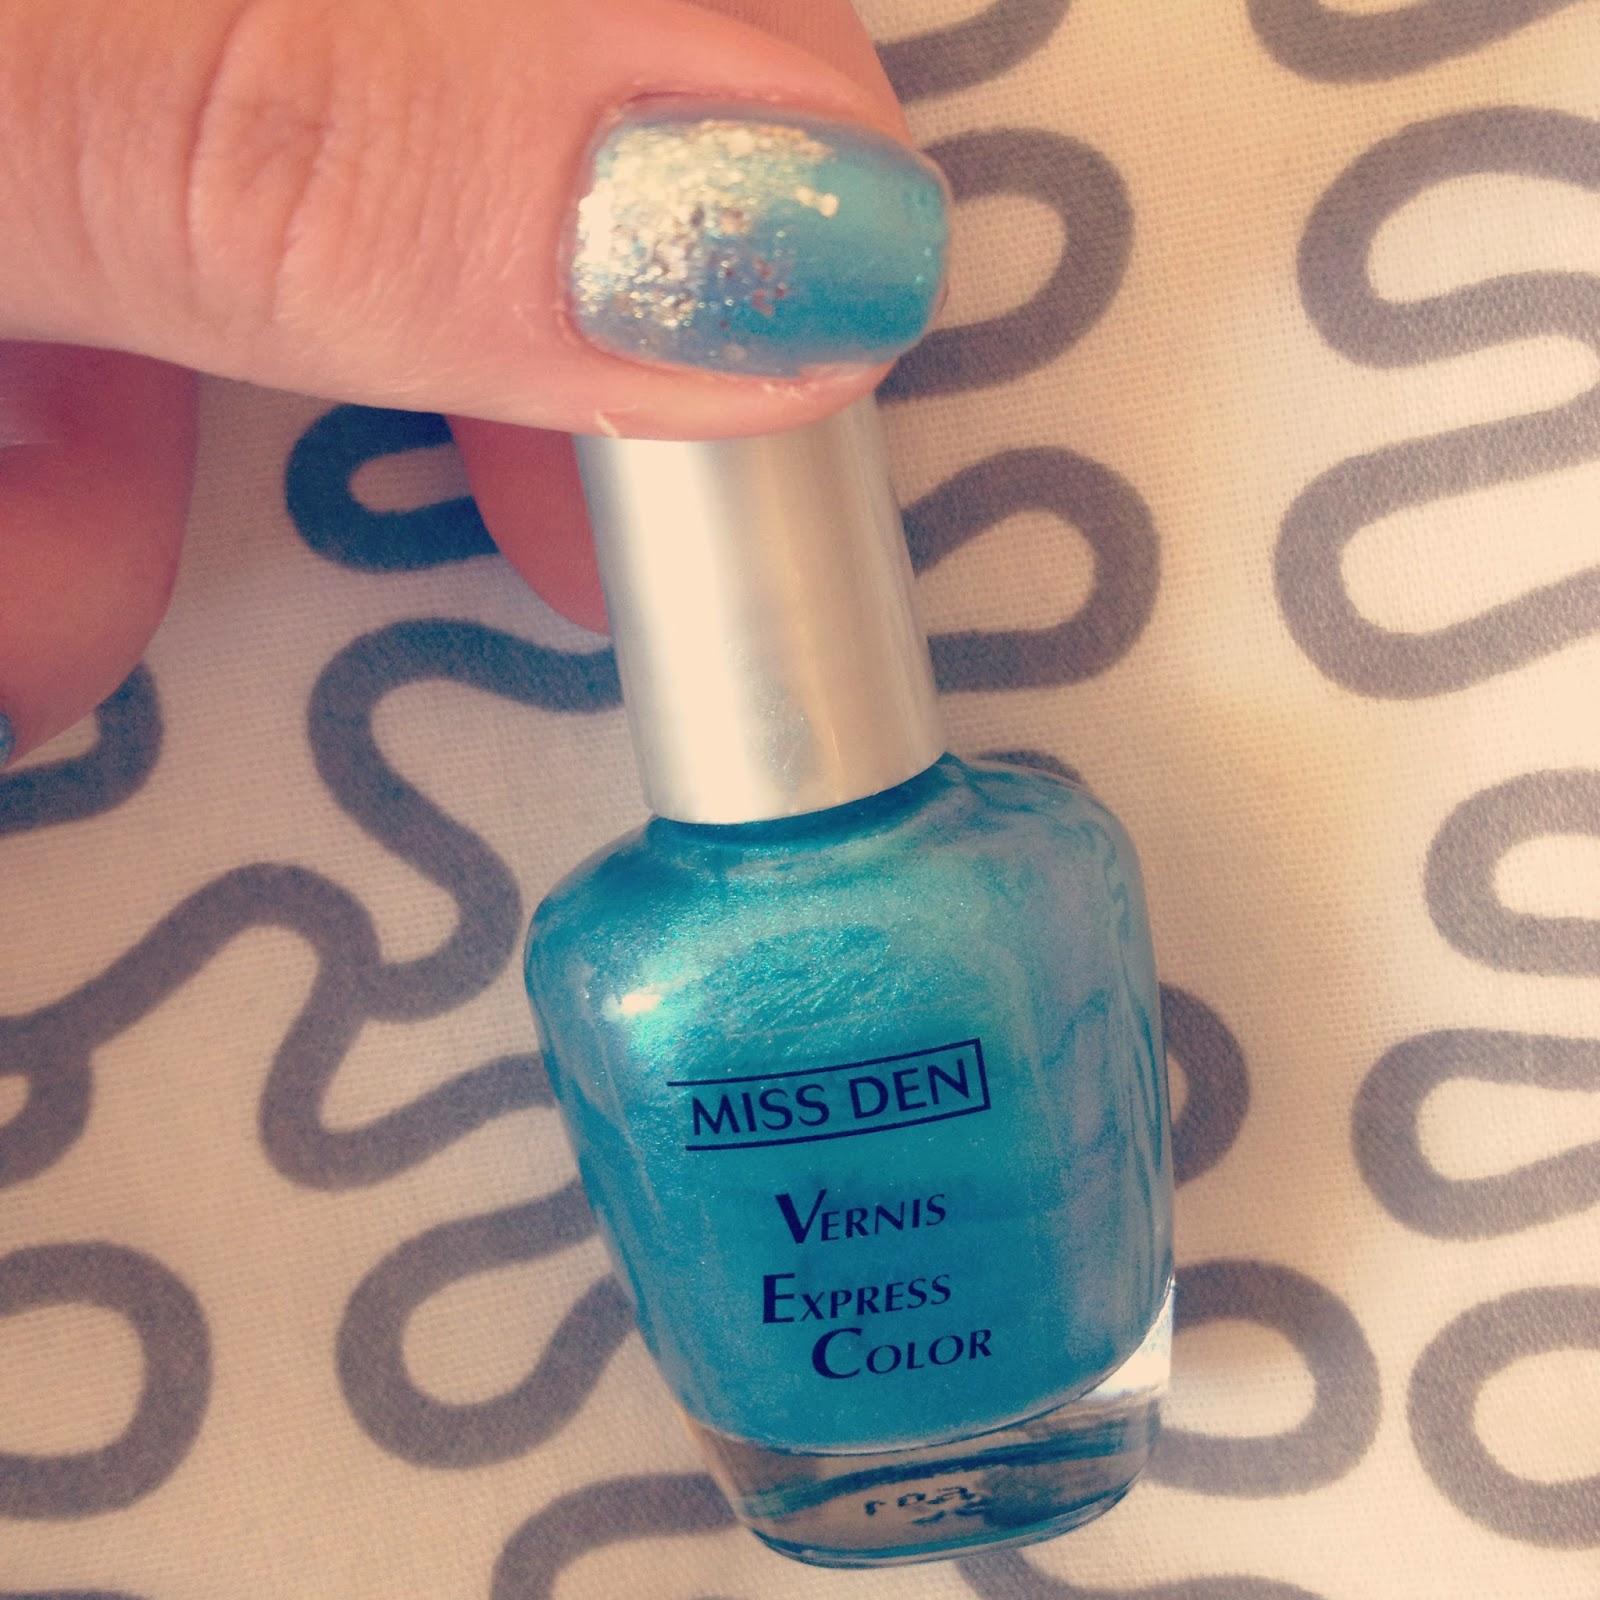 Miss Den Vernis Express Color Nail Polish Blue Star